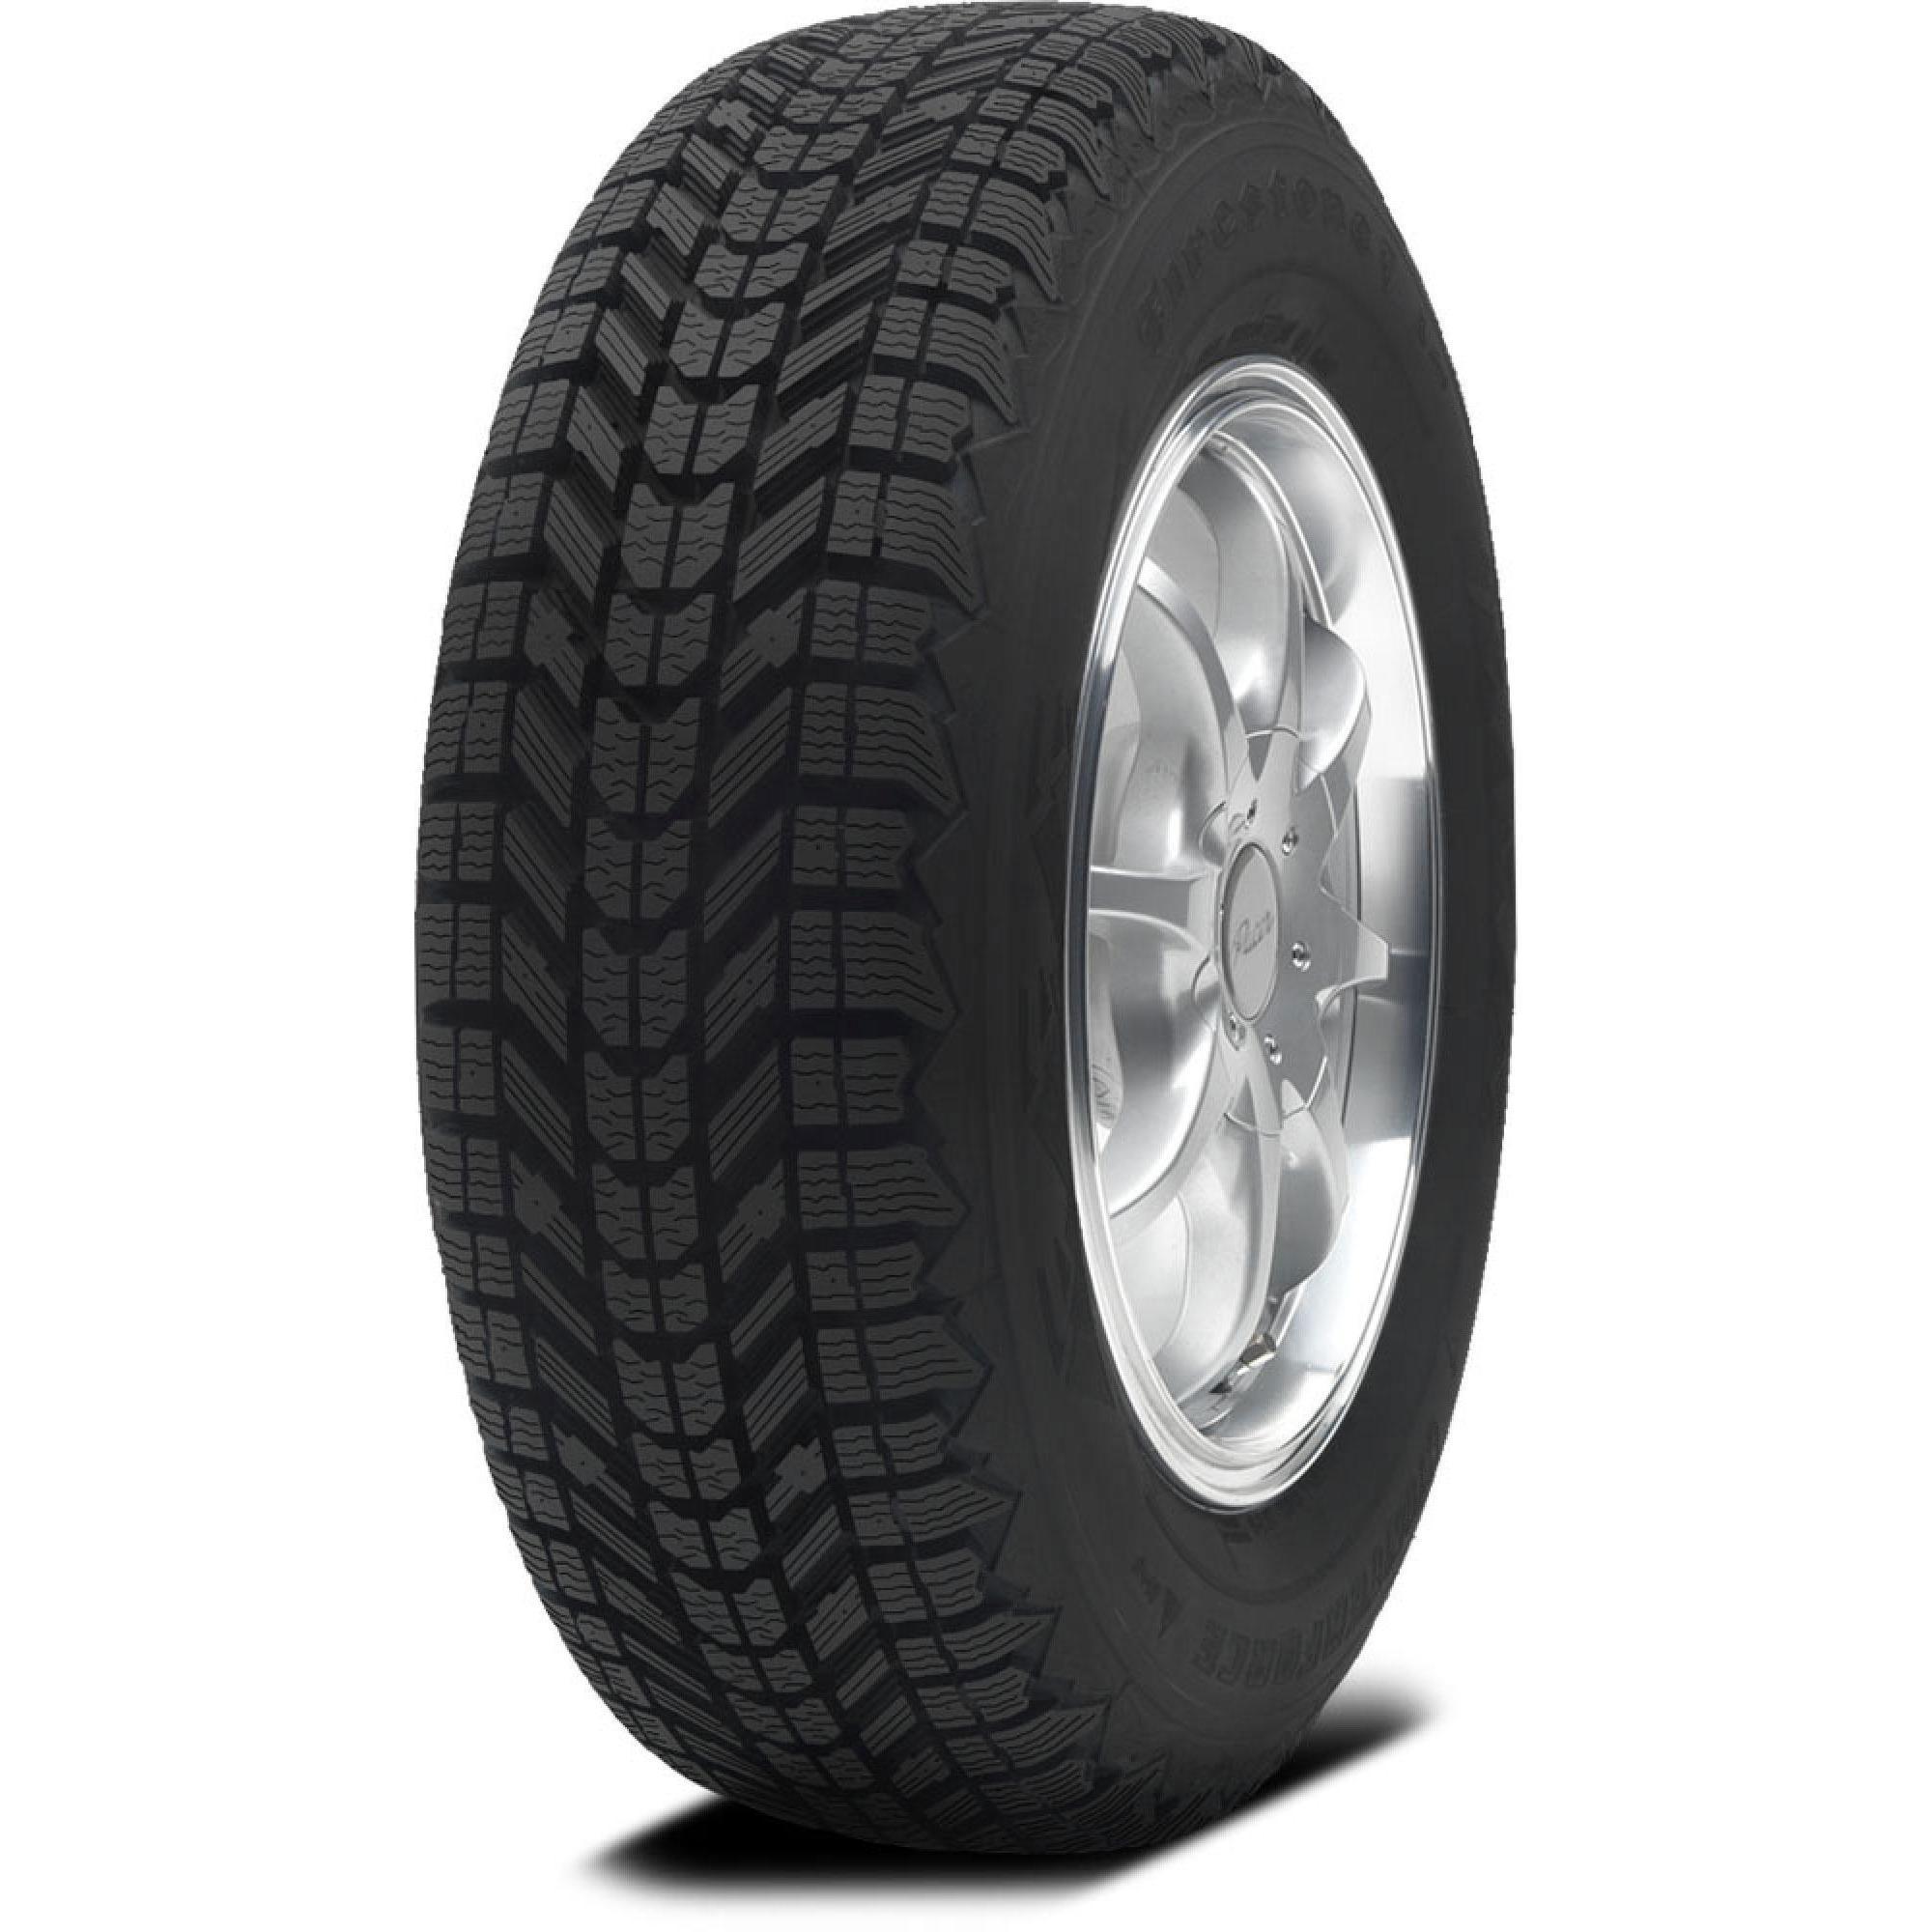 Firestone Winterforce Tires >> Firestone Winterforce UV | TireBuyer